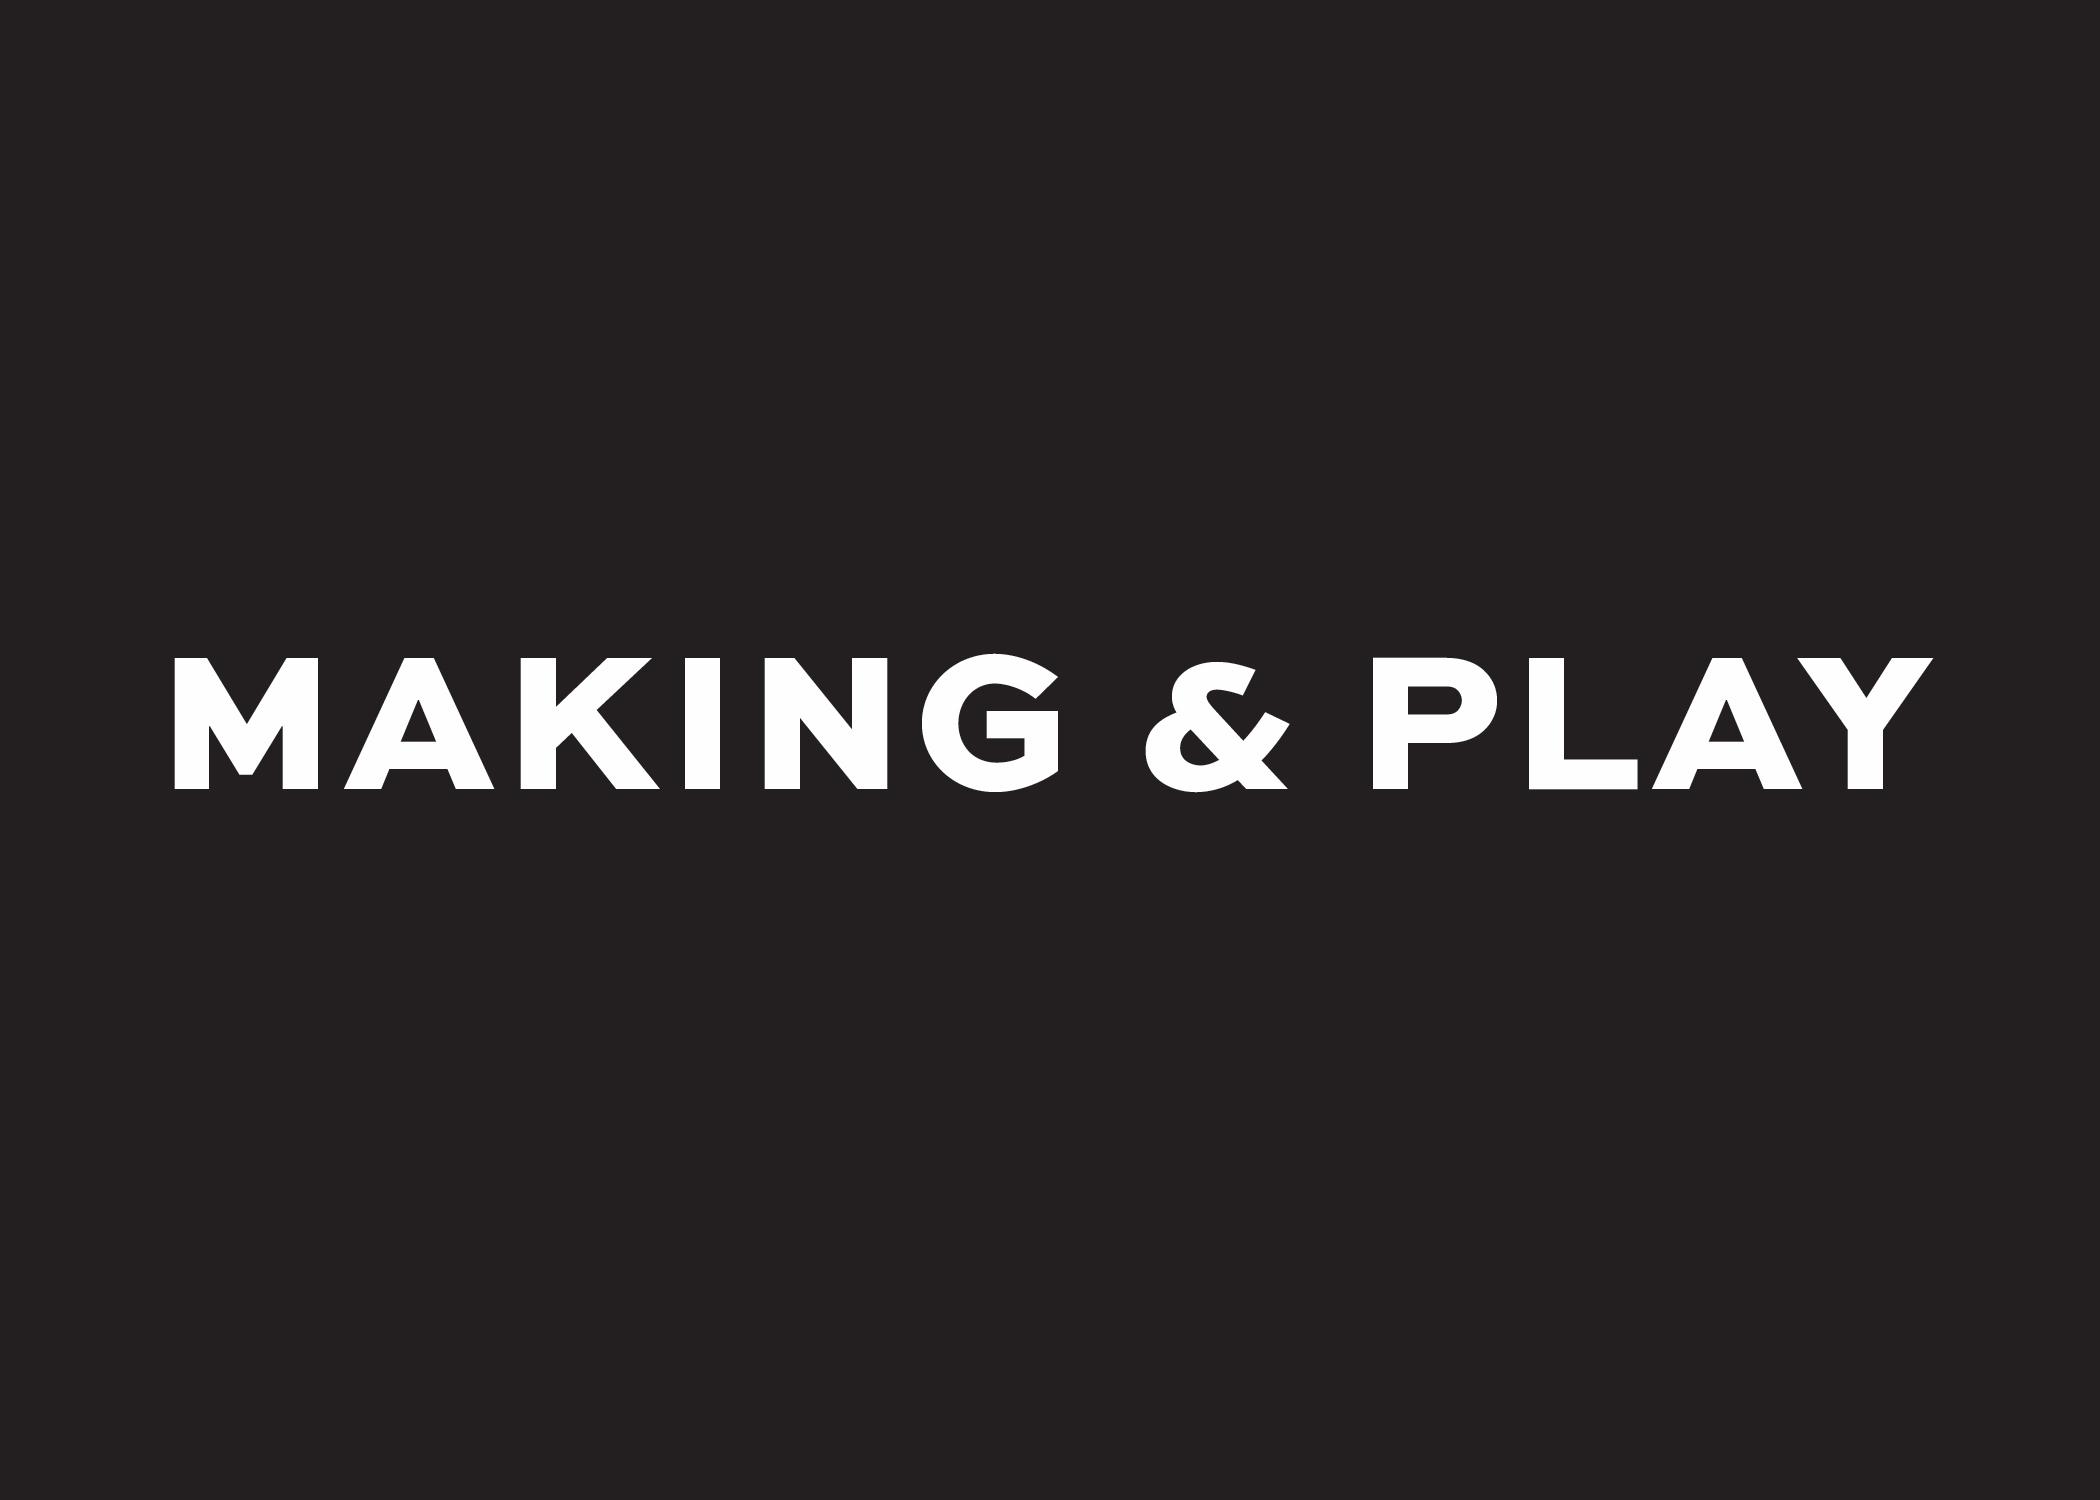 Making & Play